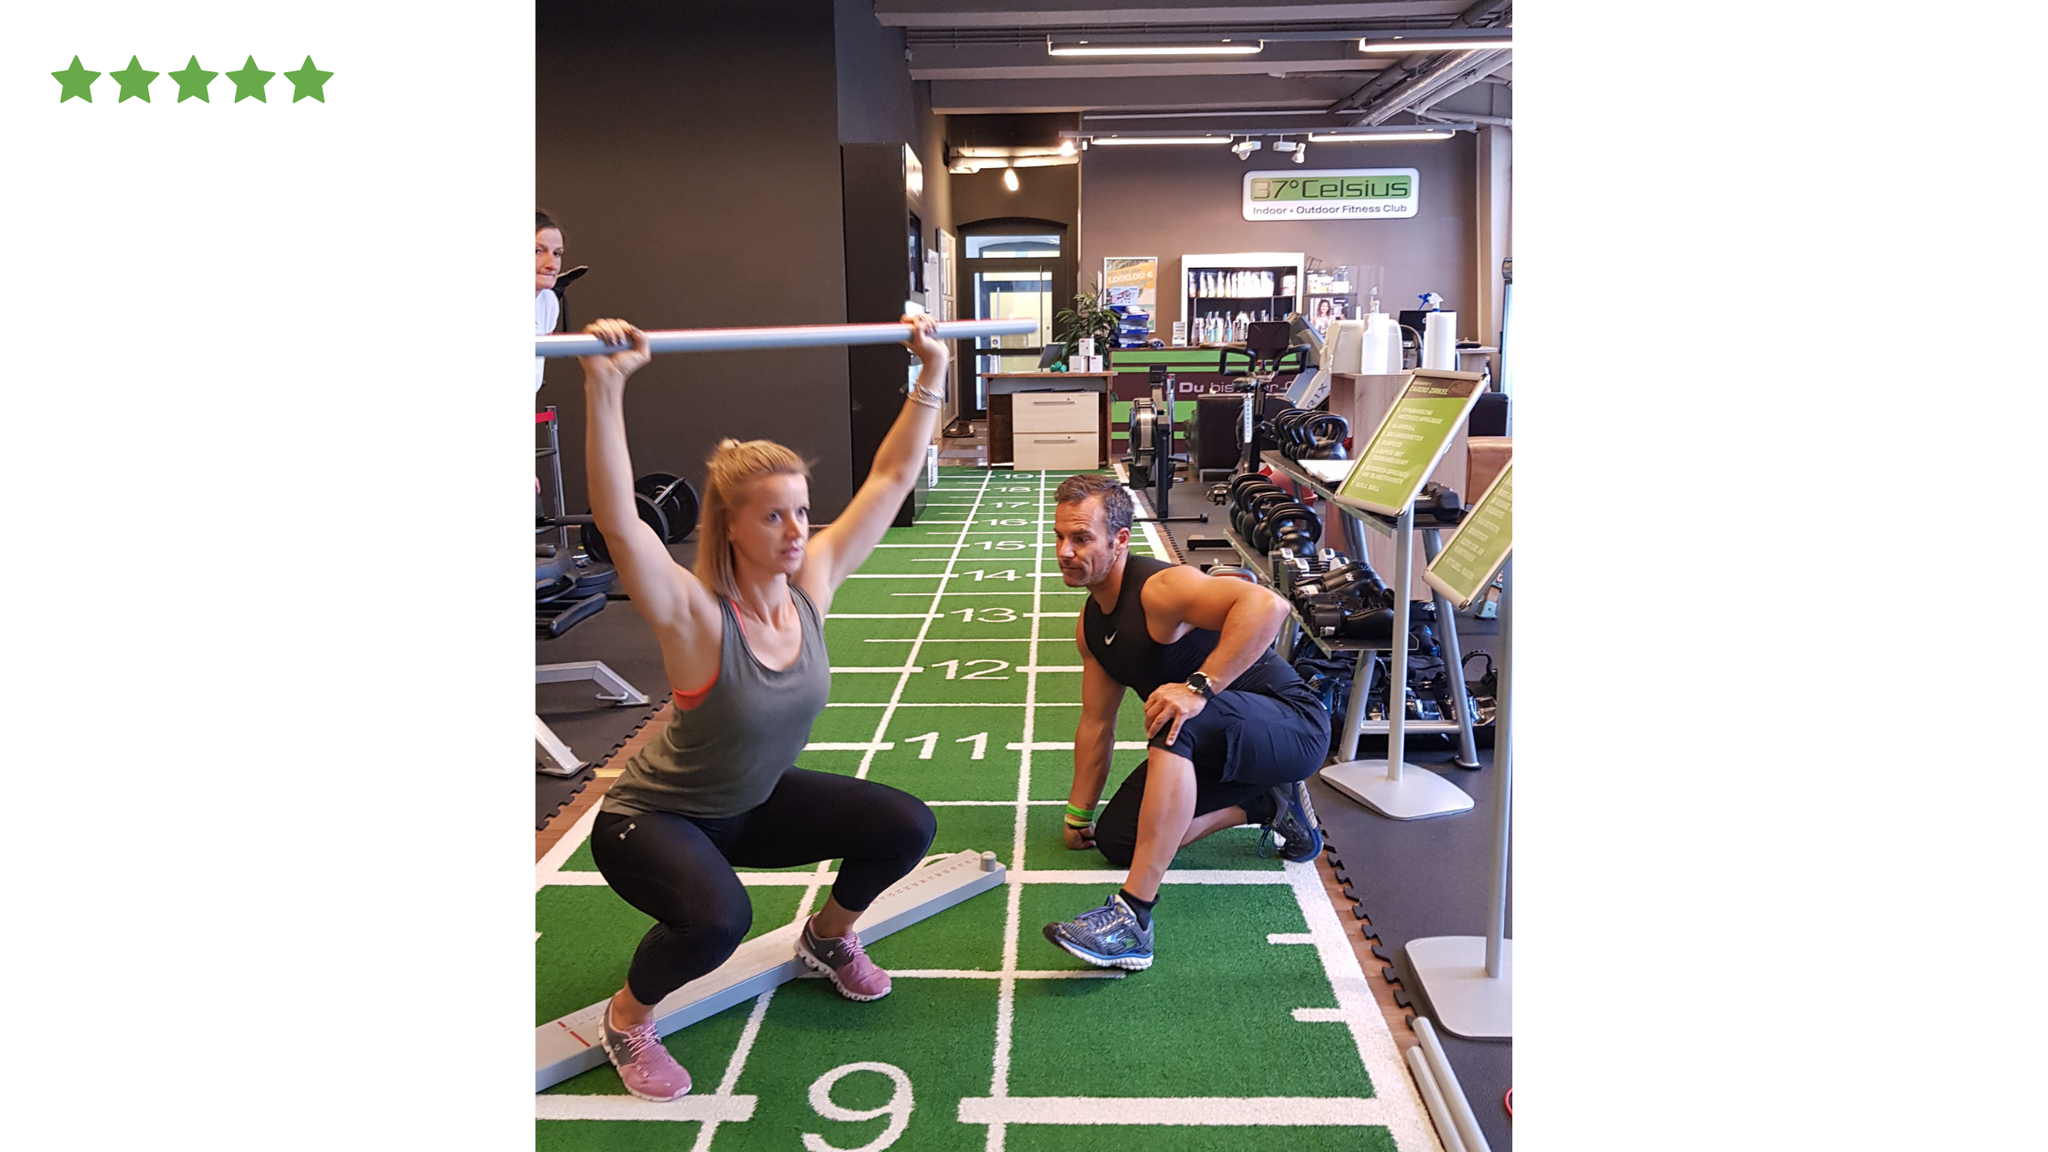 Functionalmovementscreen mit Steffi Reischl im 37° Celsius Fitnessclub in Rosenheim